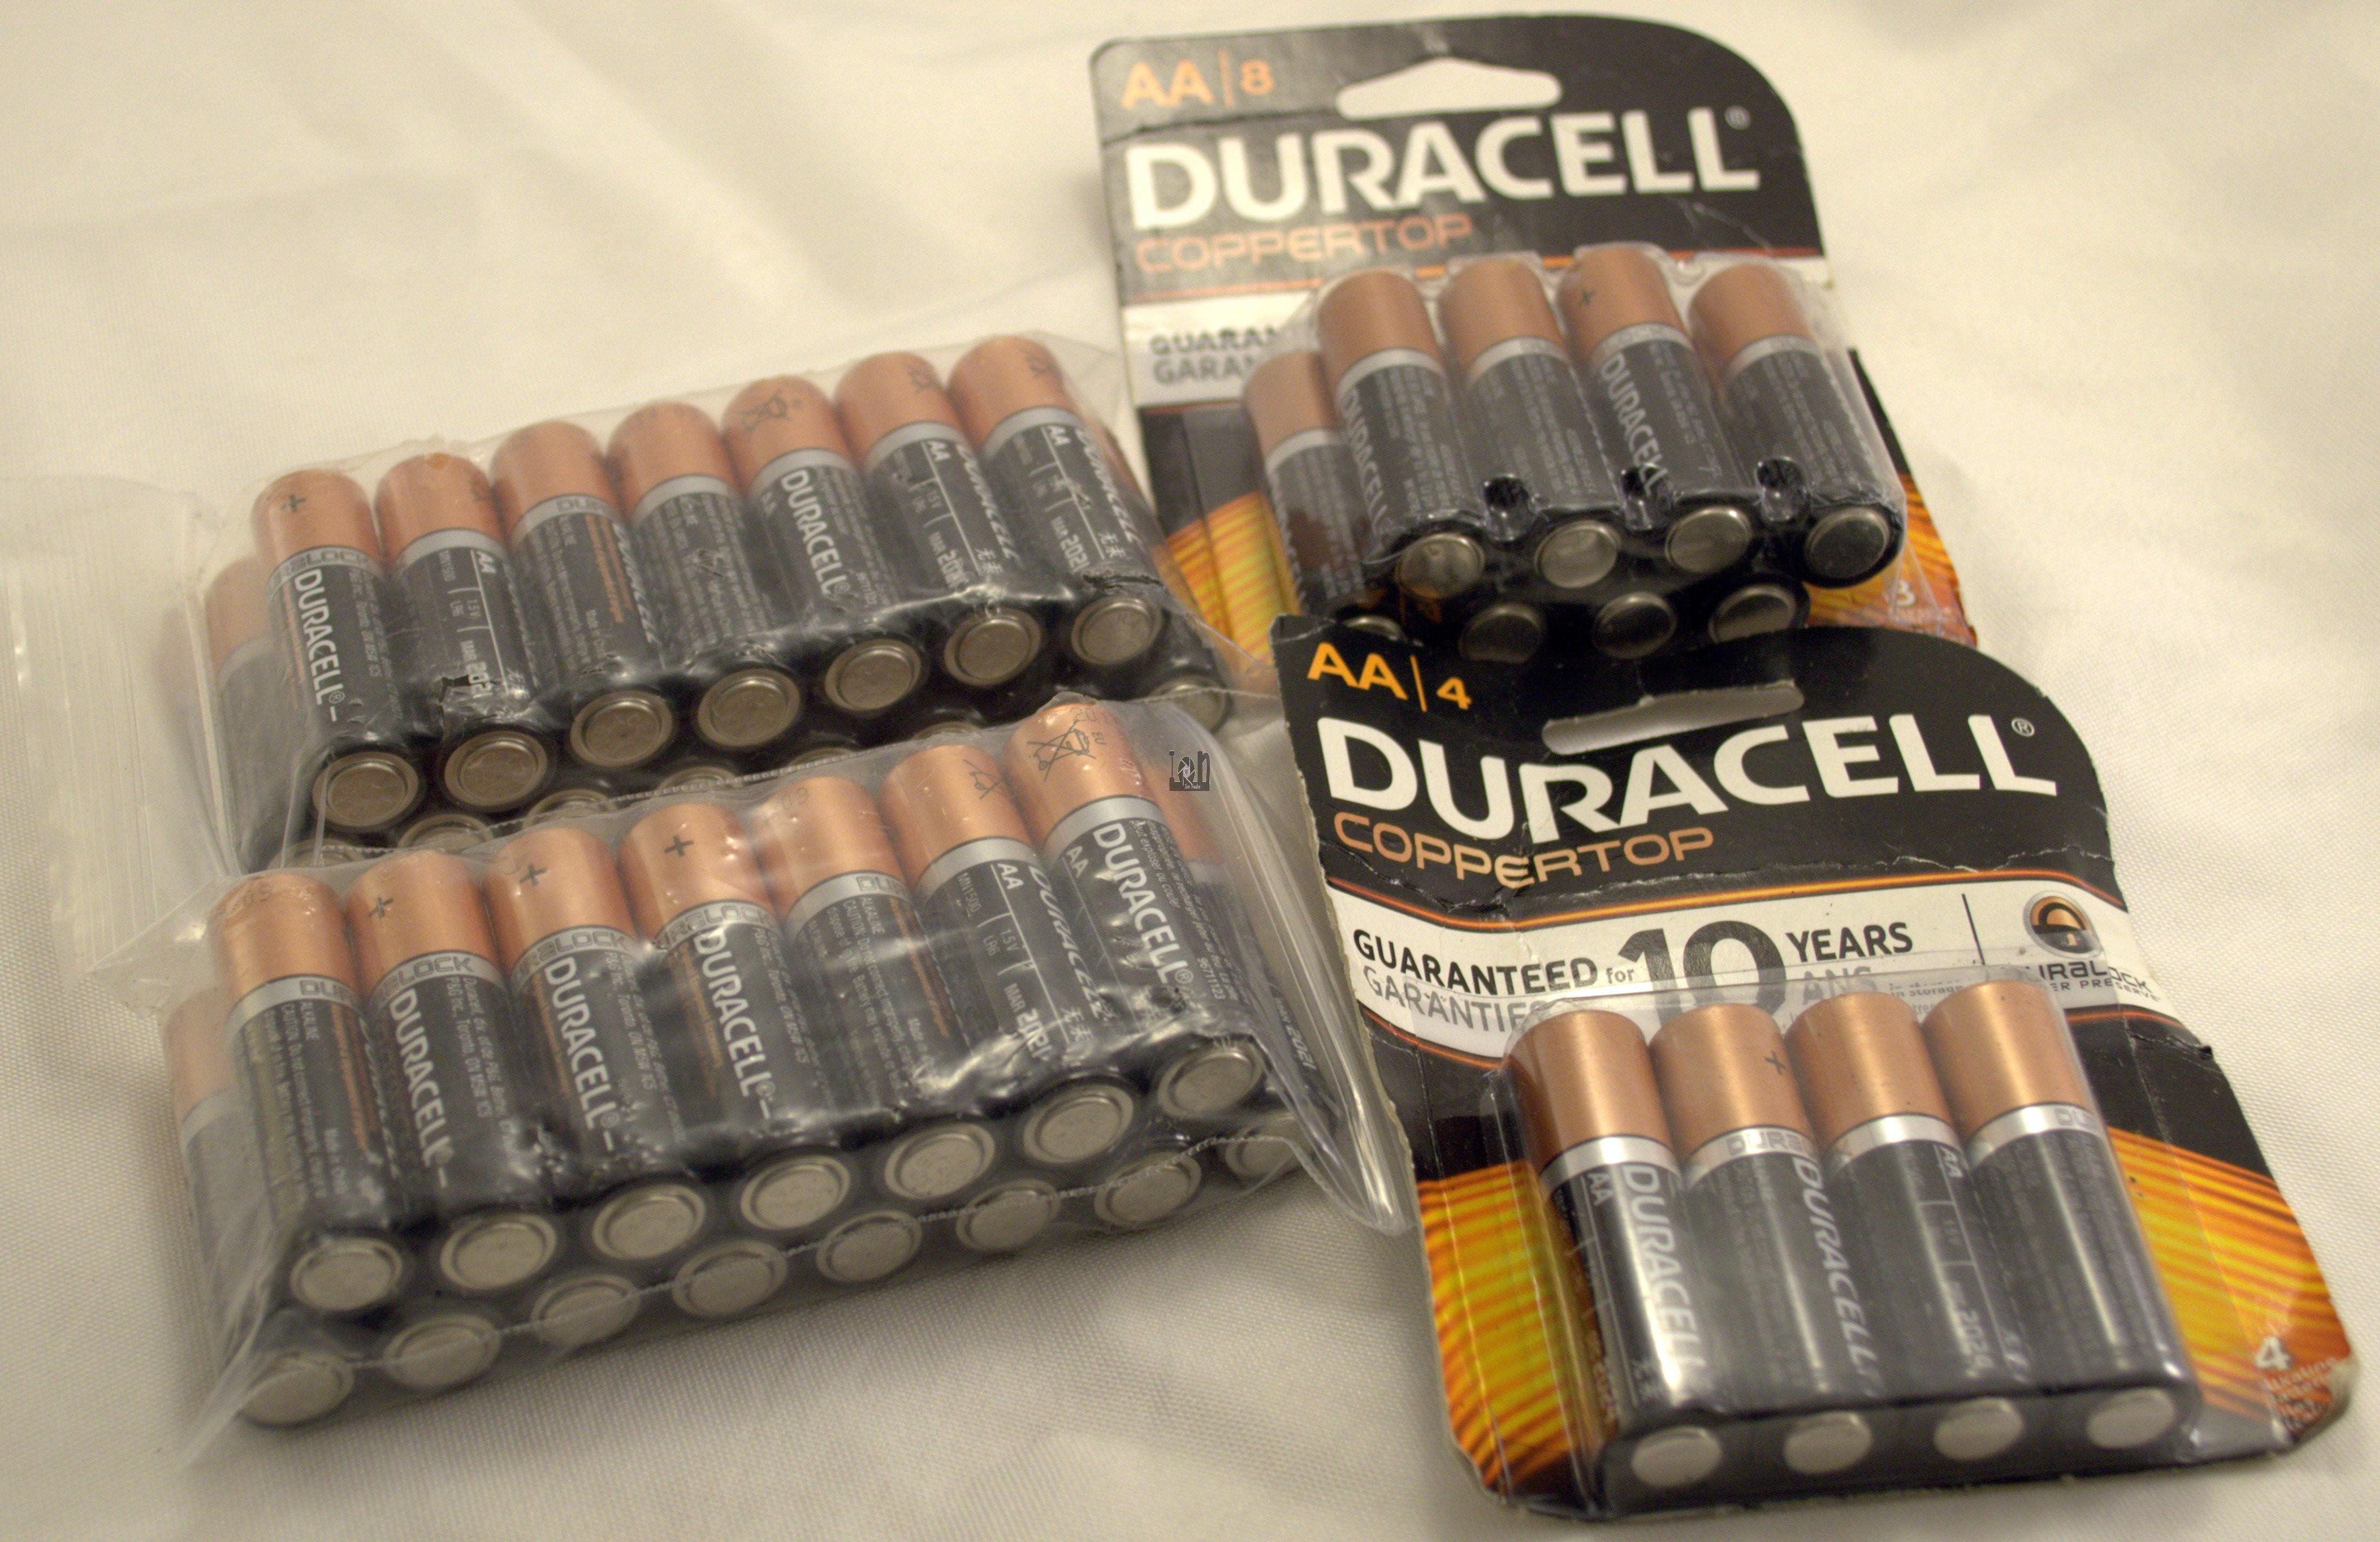 Duracell 42pc Lot AA Batteries AA Battery Coppertop Alkaline